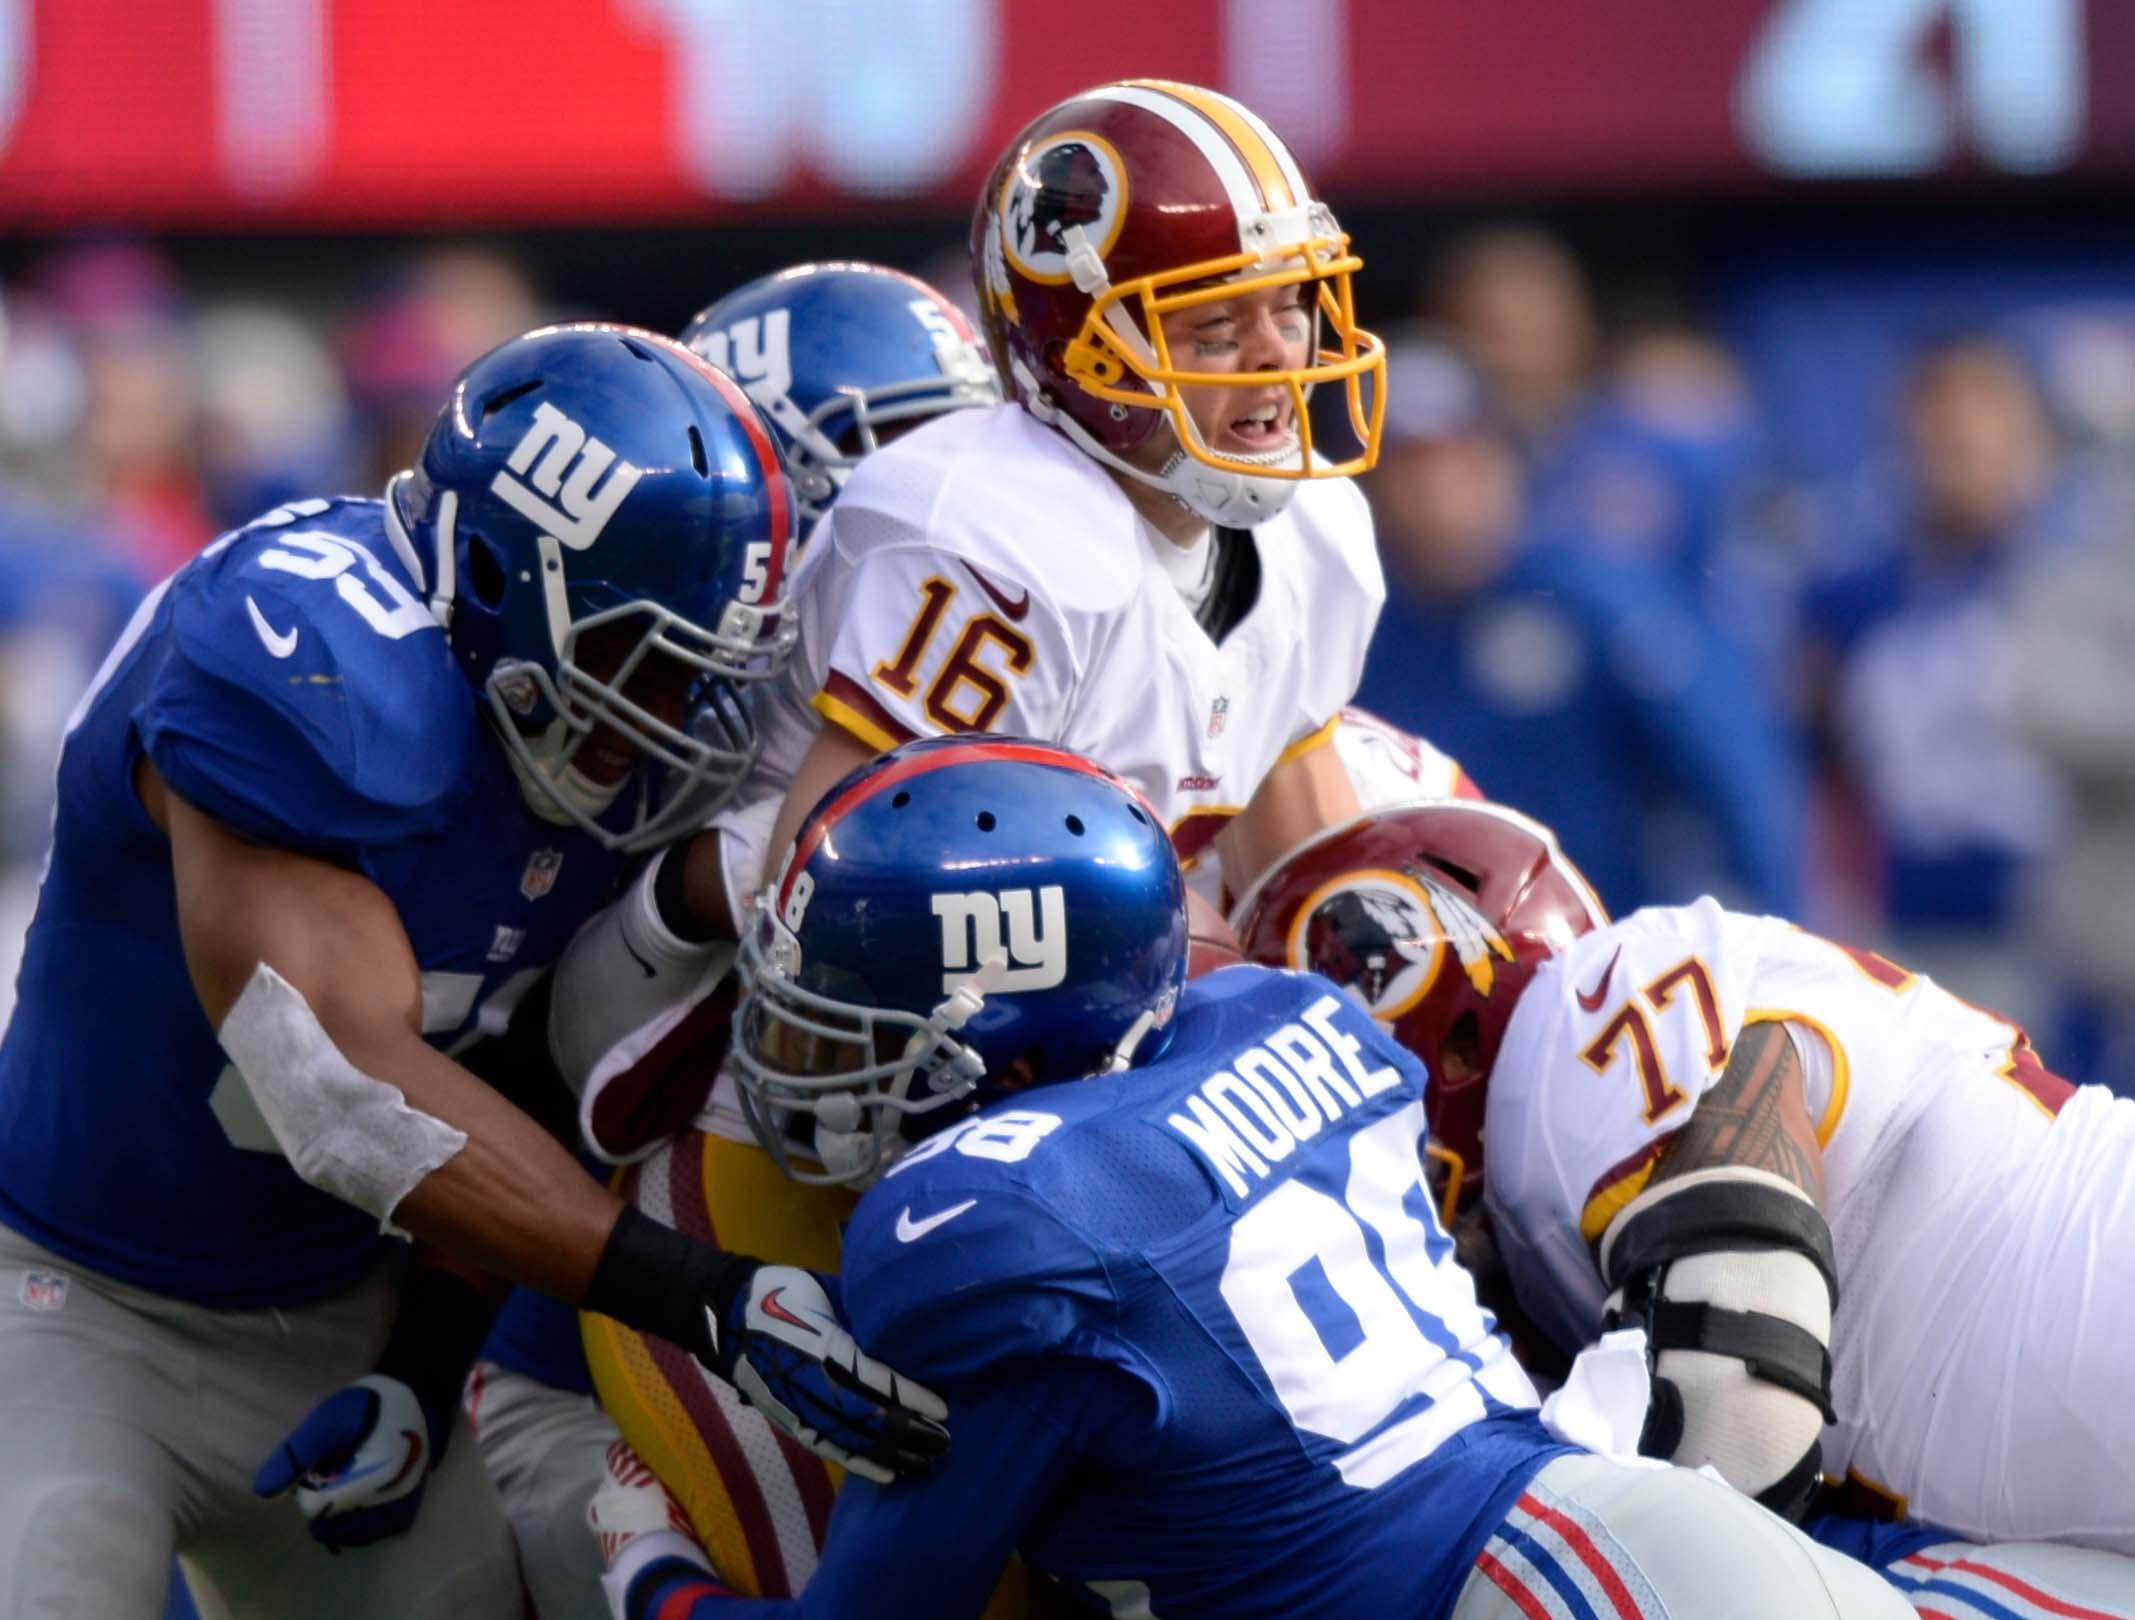 Can the Giants continue terrorizing opposing quarterbacks?